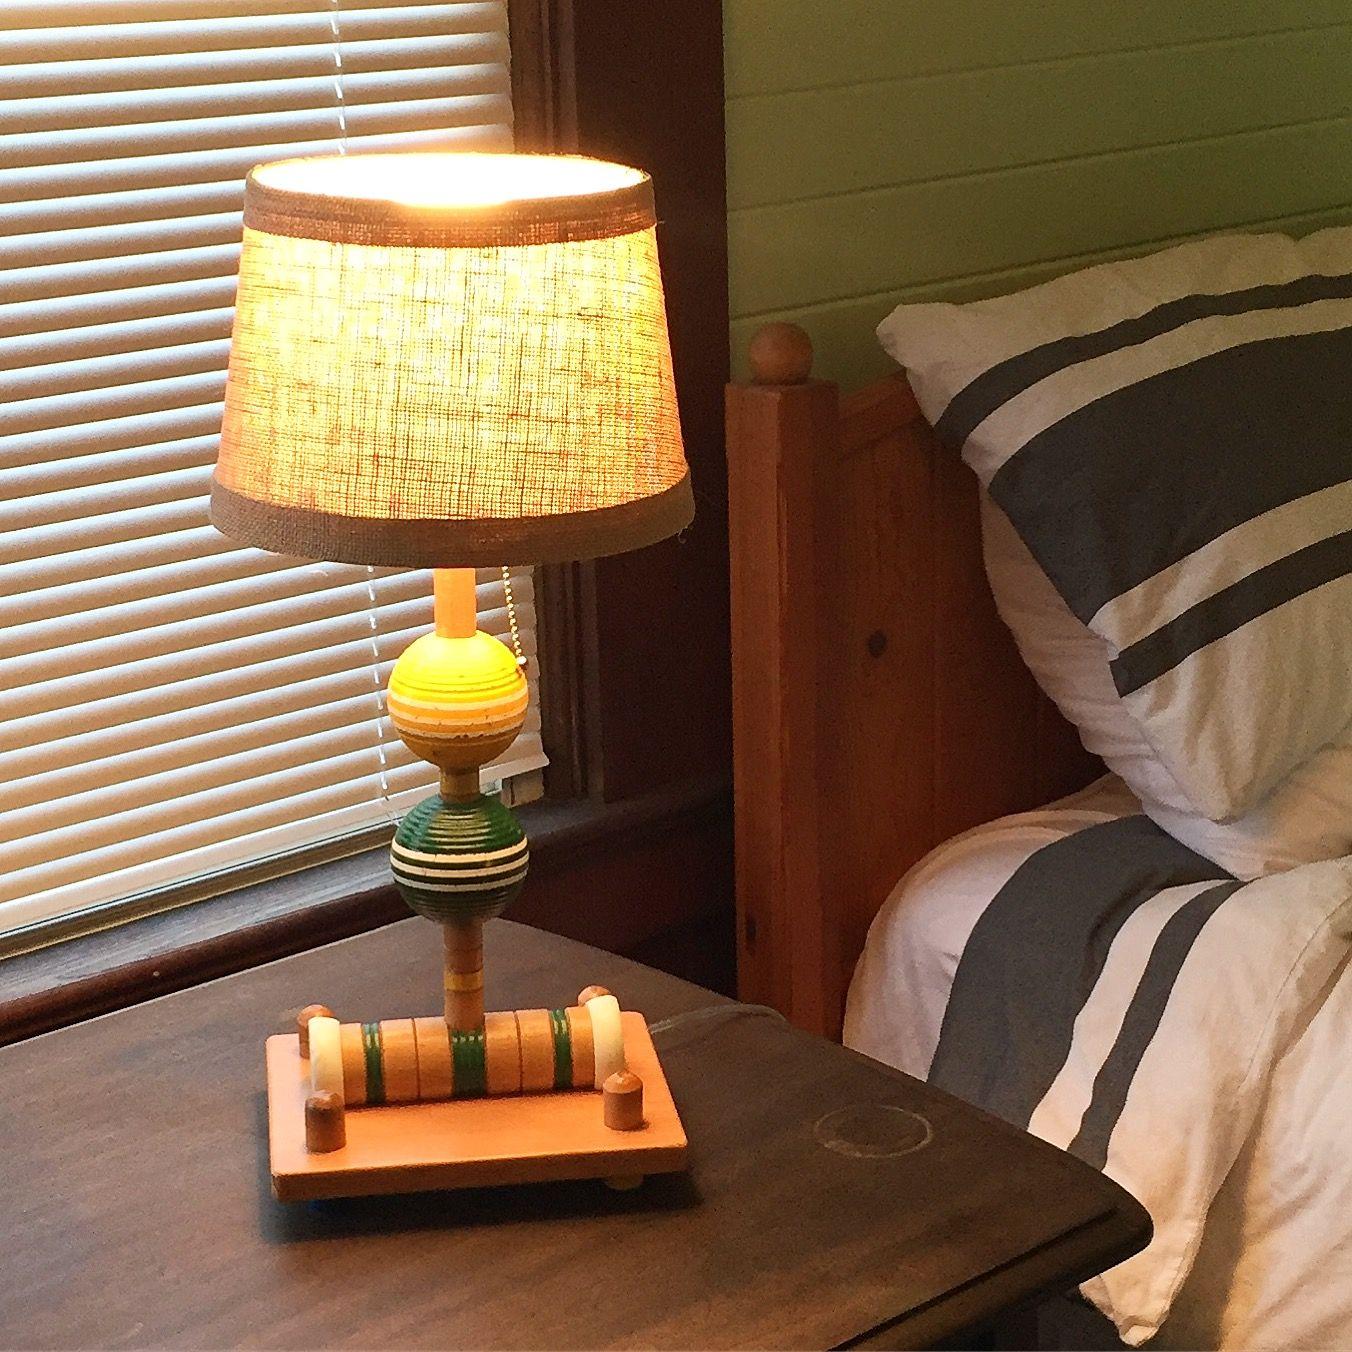 Repurposed croquet set as table lamp. Diy light fixtures